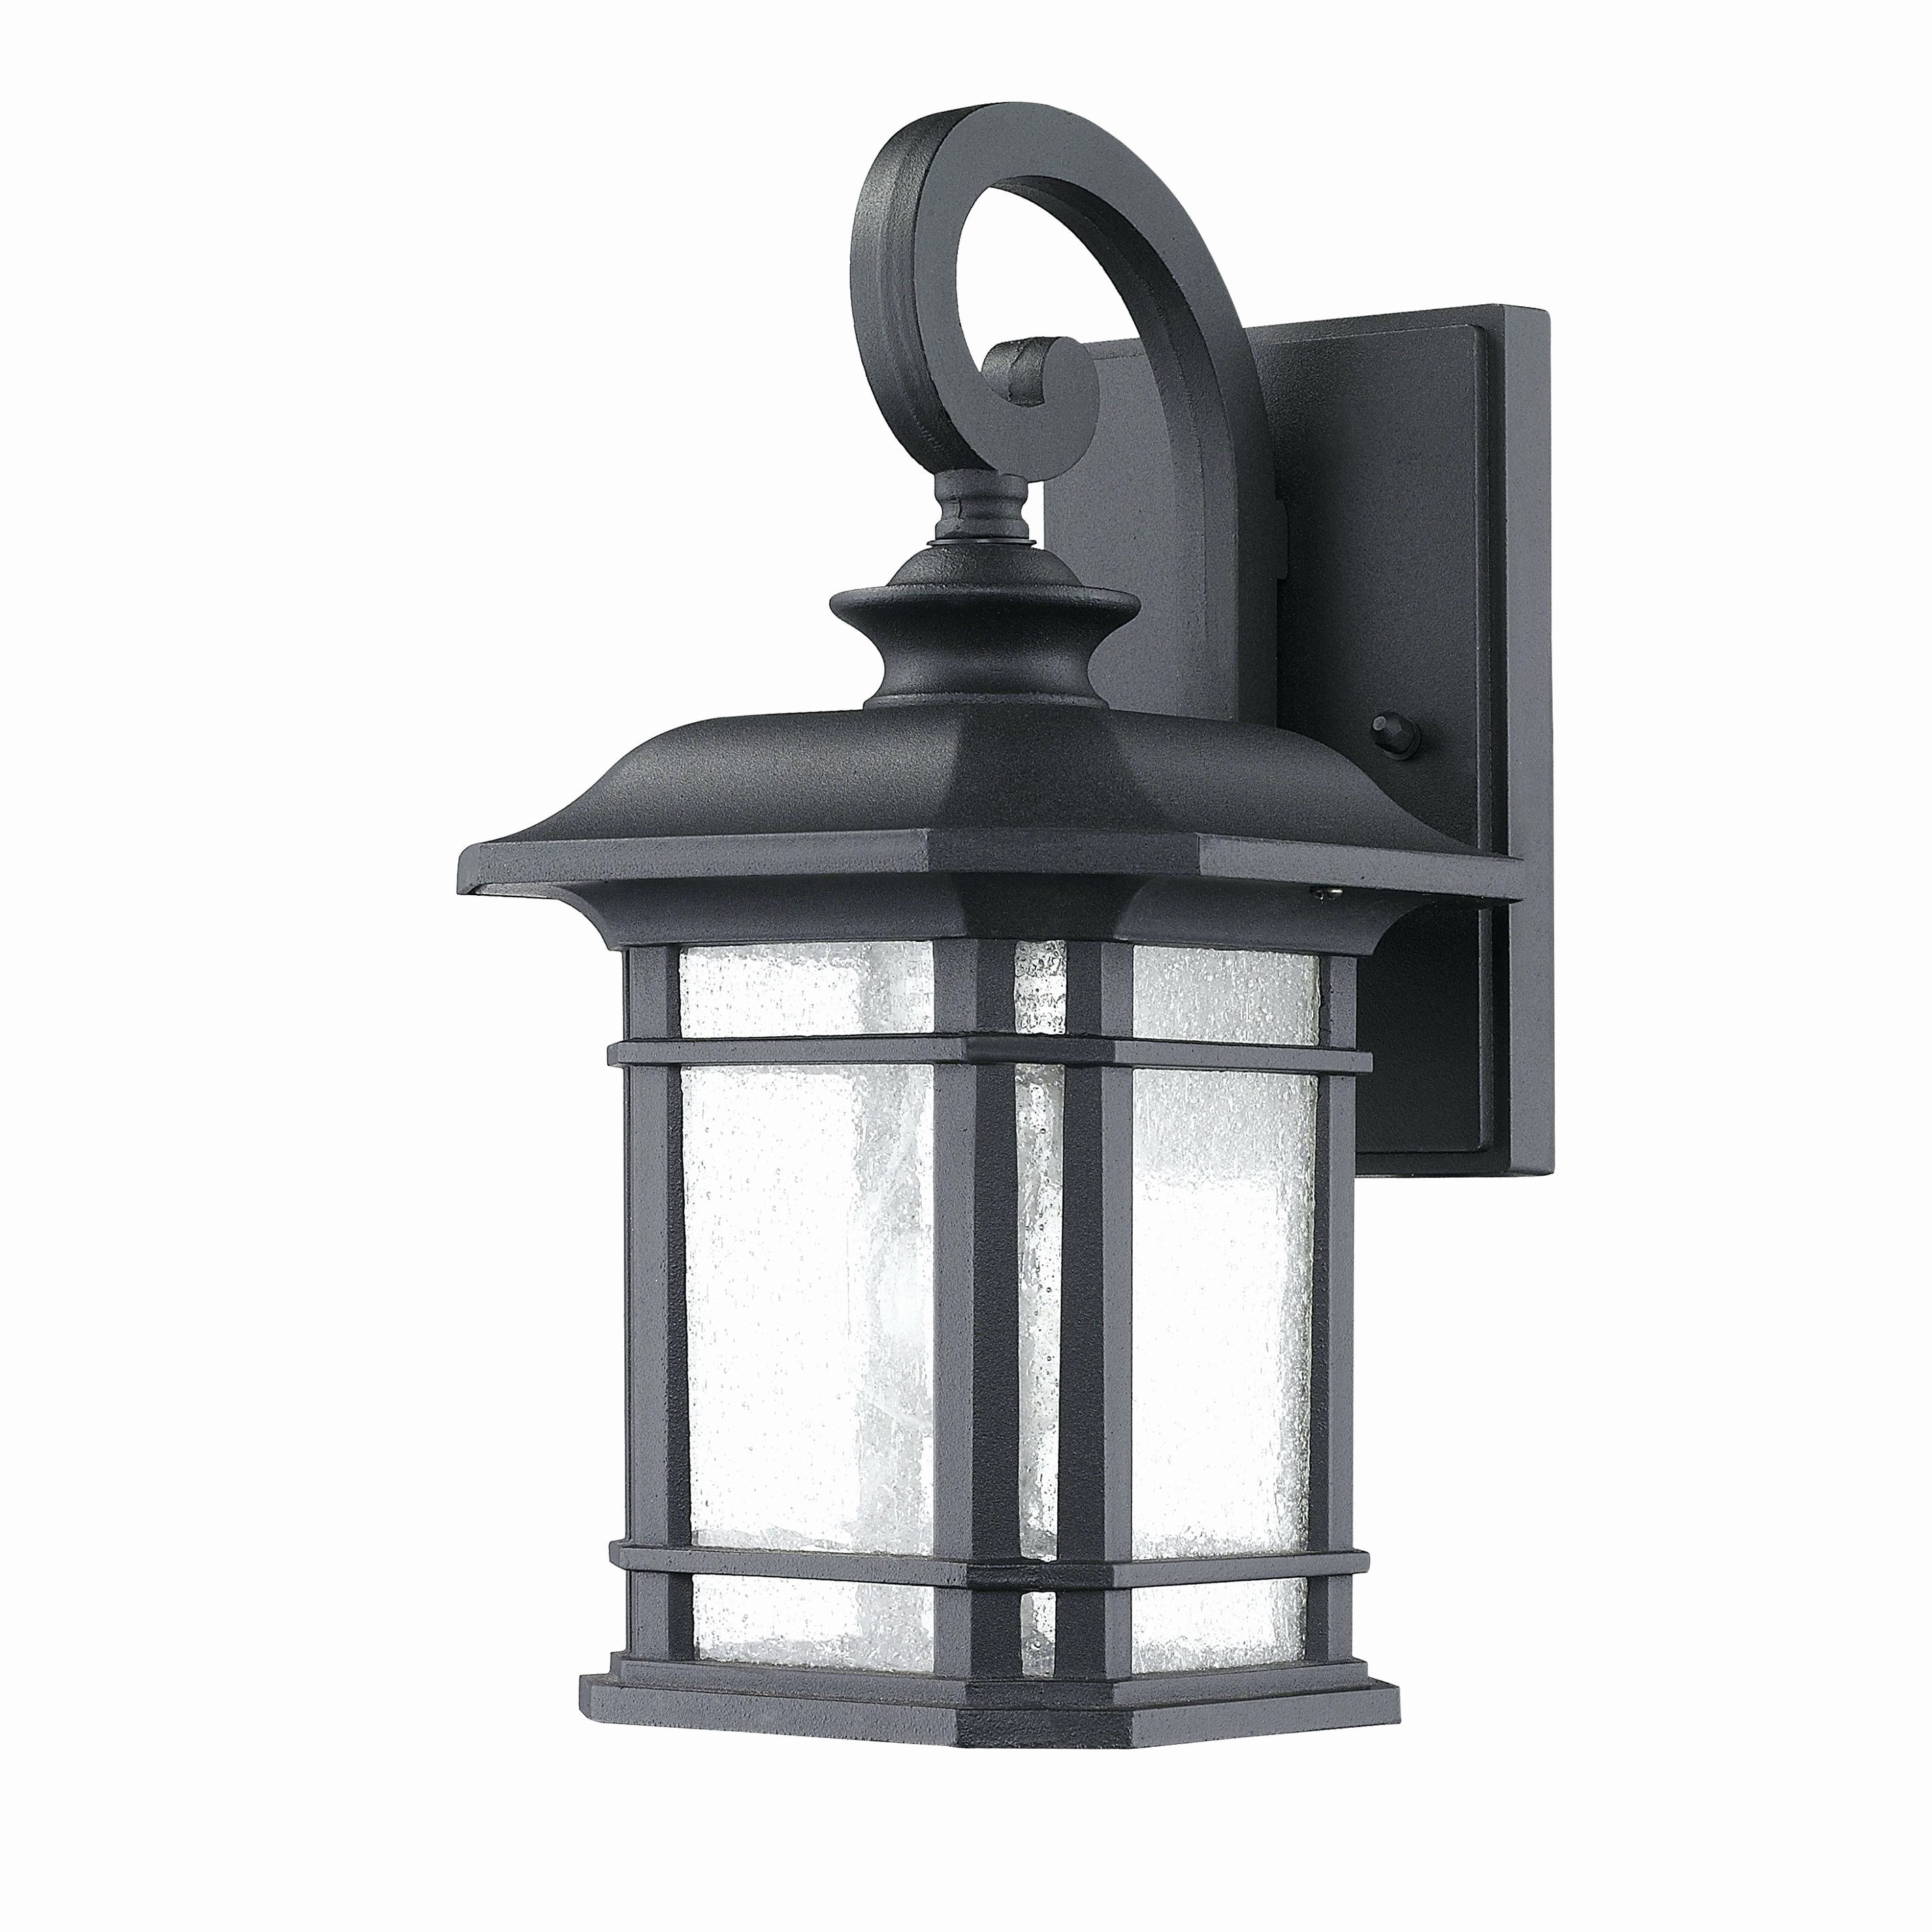 2019 Motion Sensor Post Light Elegant Outdoor Garage Outdoor Lanterns With Regard To Elegant Outdoor Lanterns (View 2 of 20)